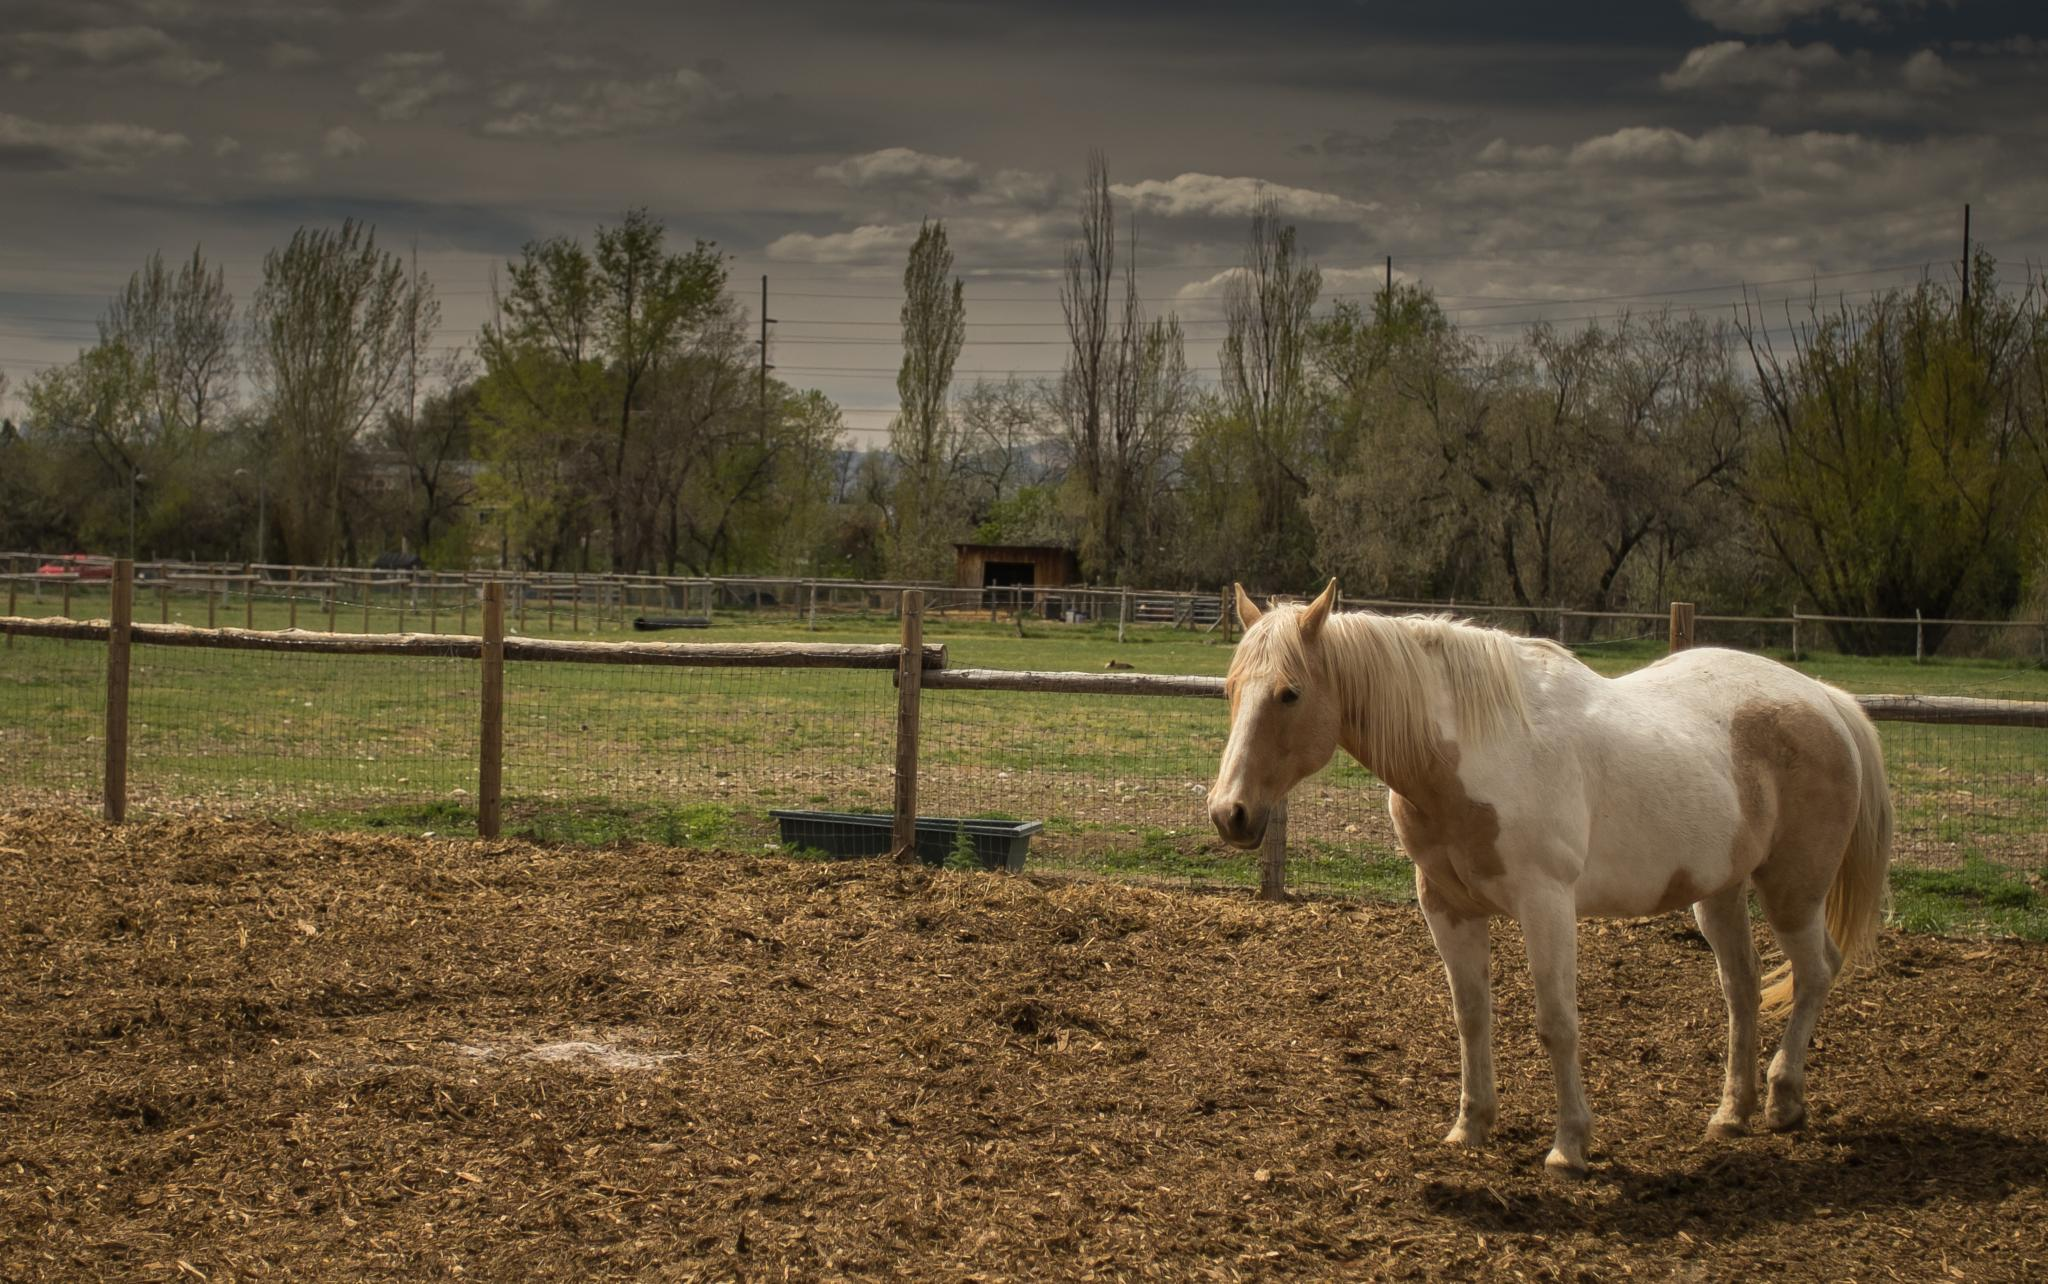 Horse by generoyzengurt